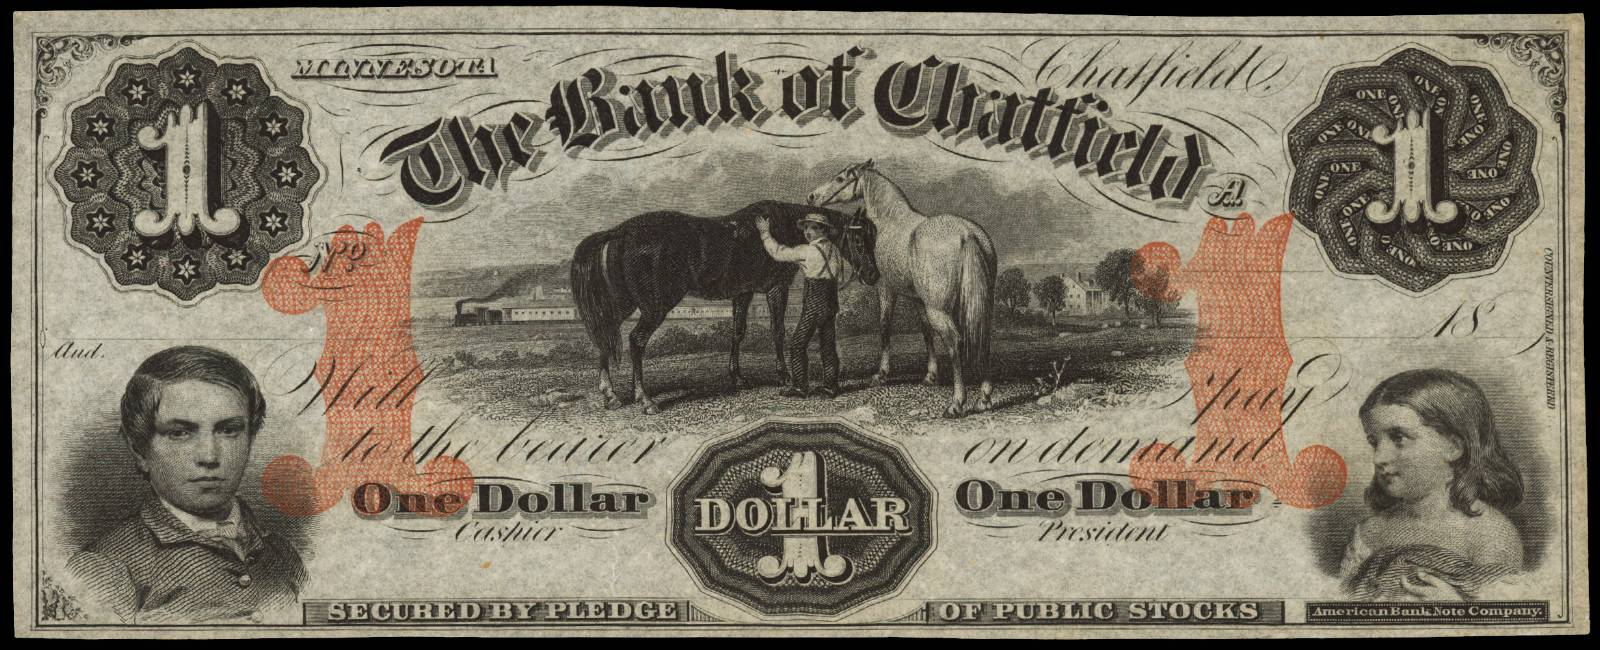 Bank of Chatfield